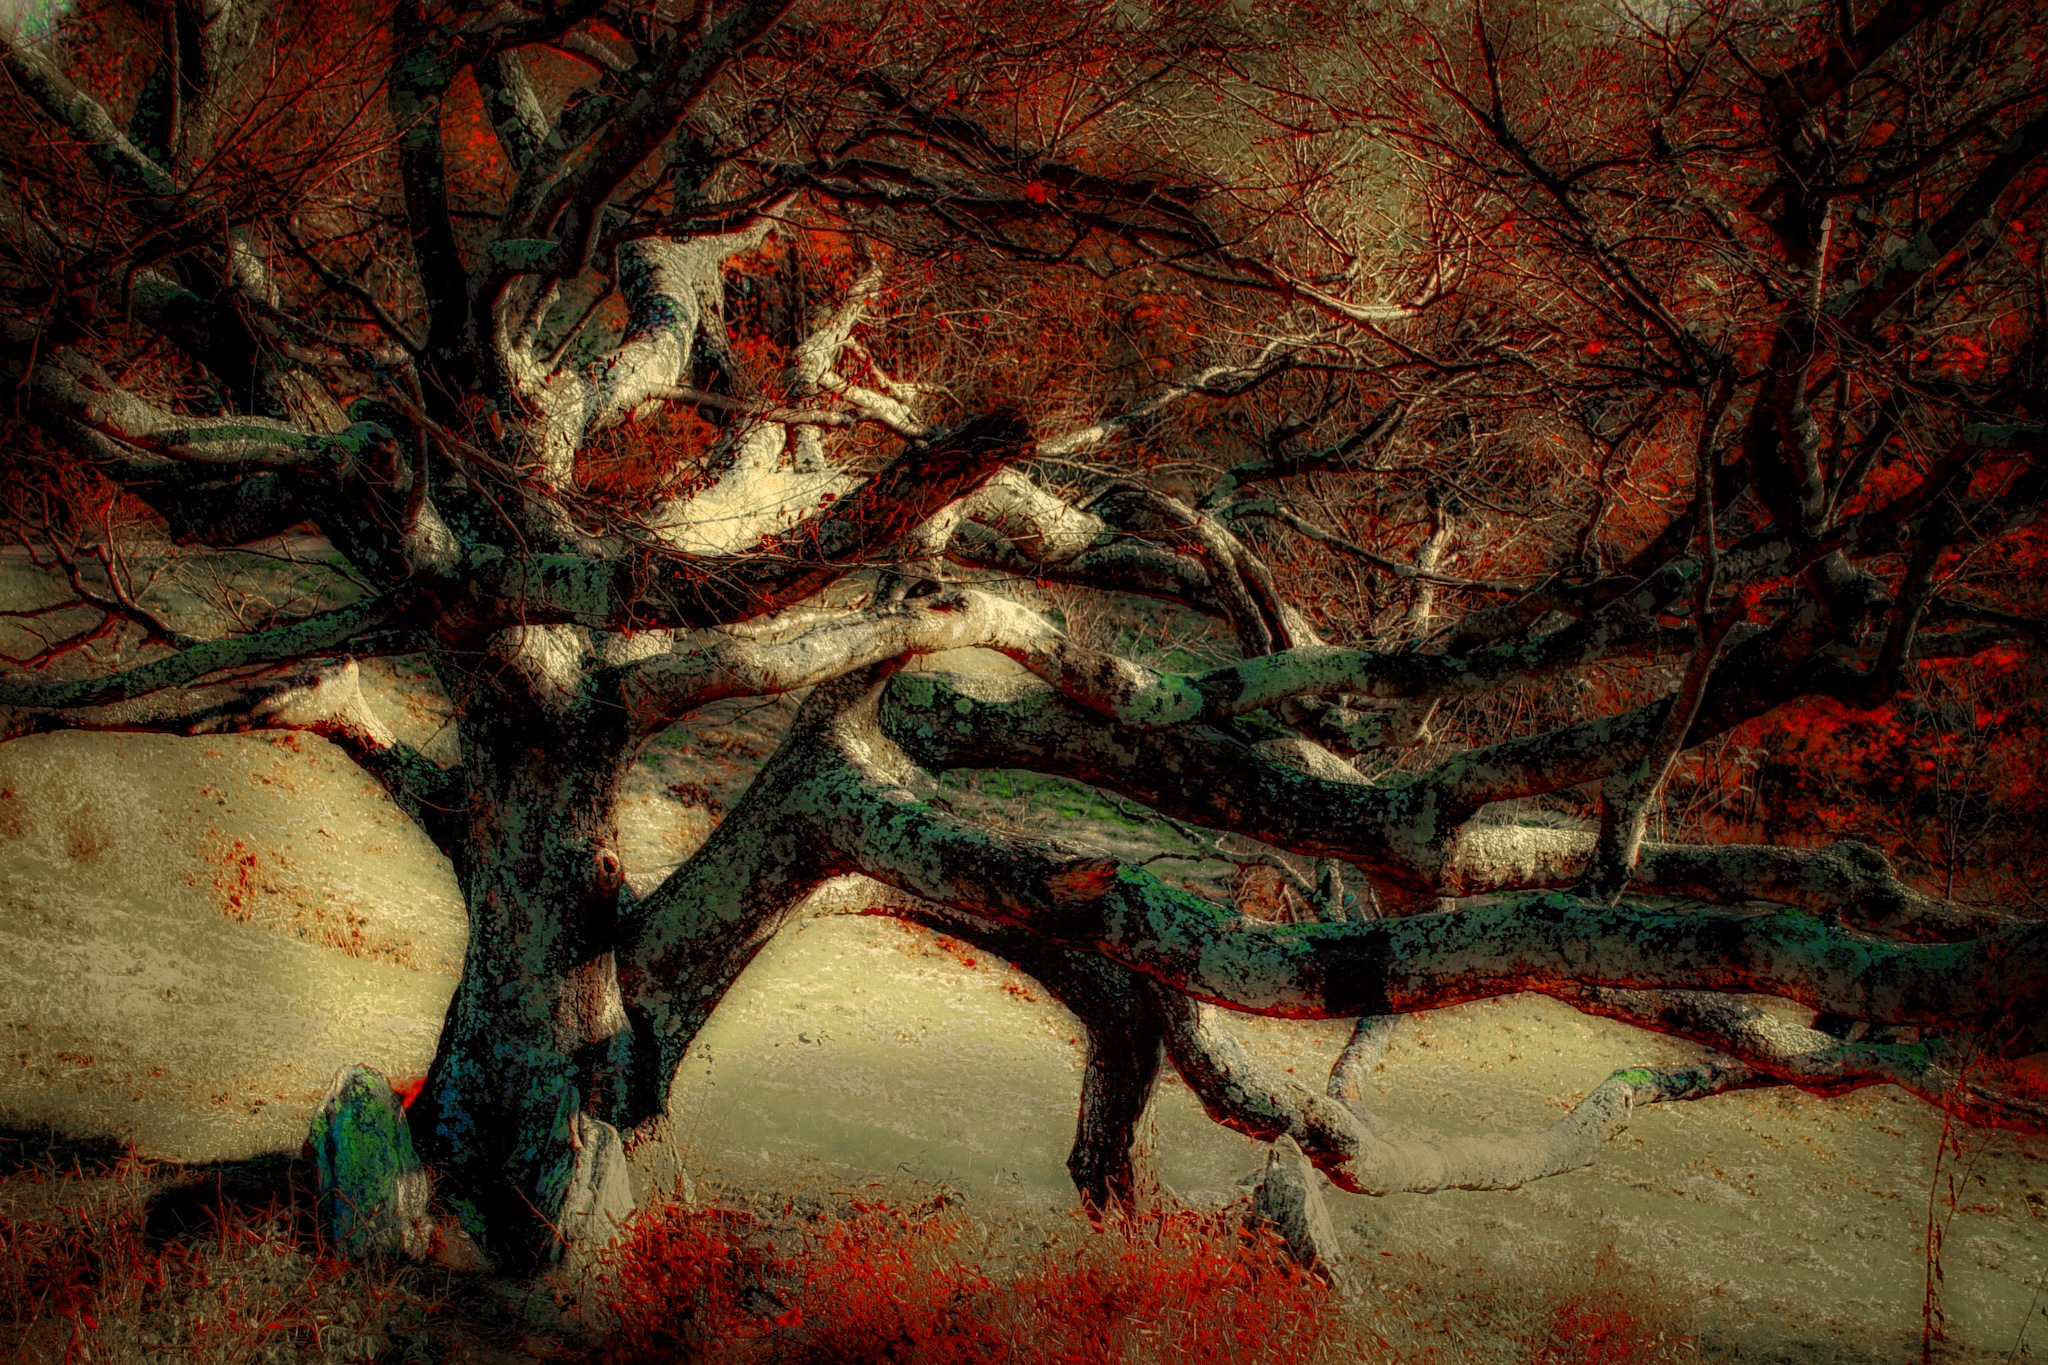 Tree of Life by David Walters